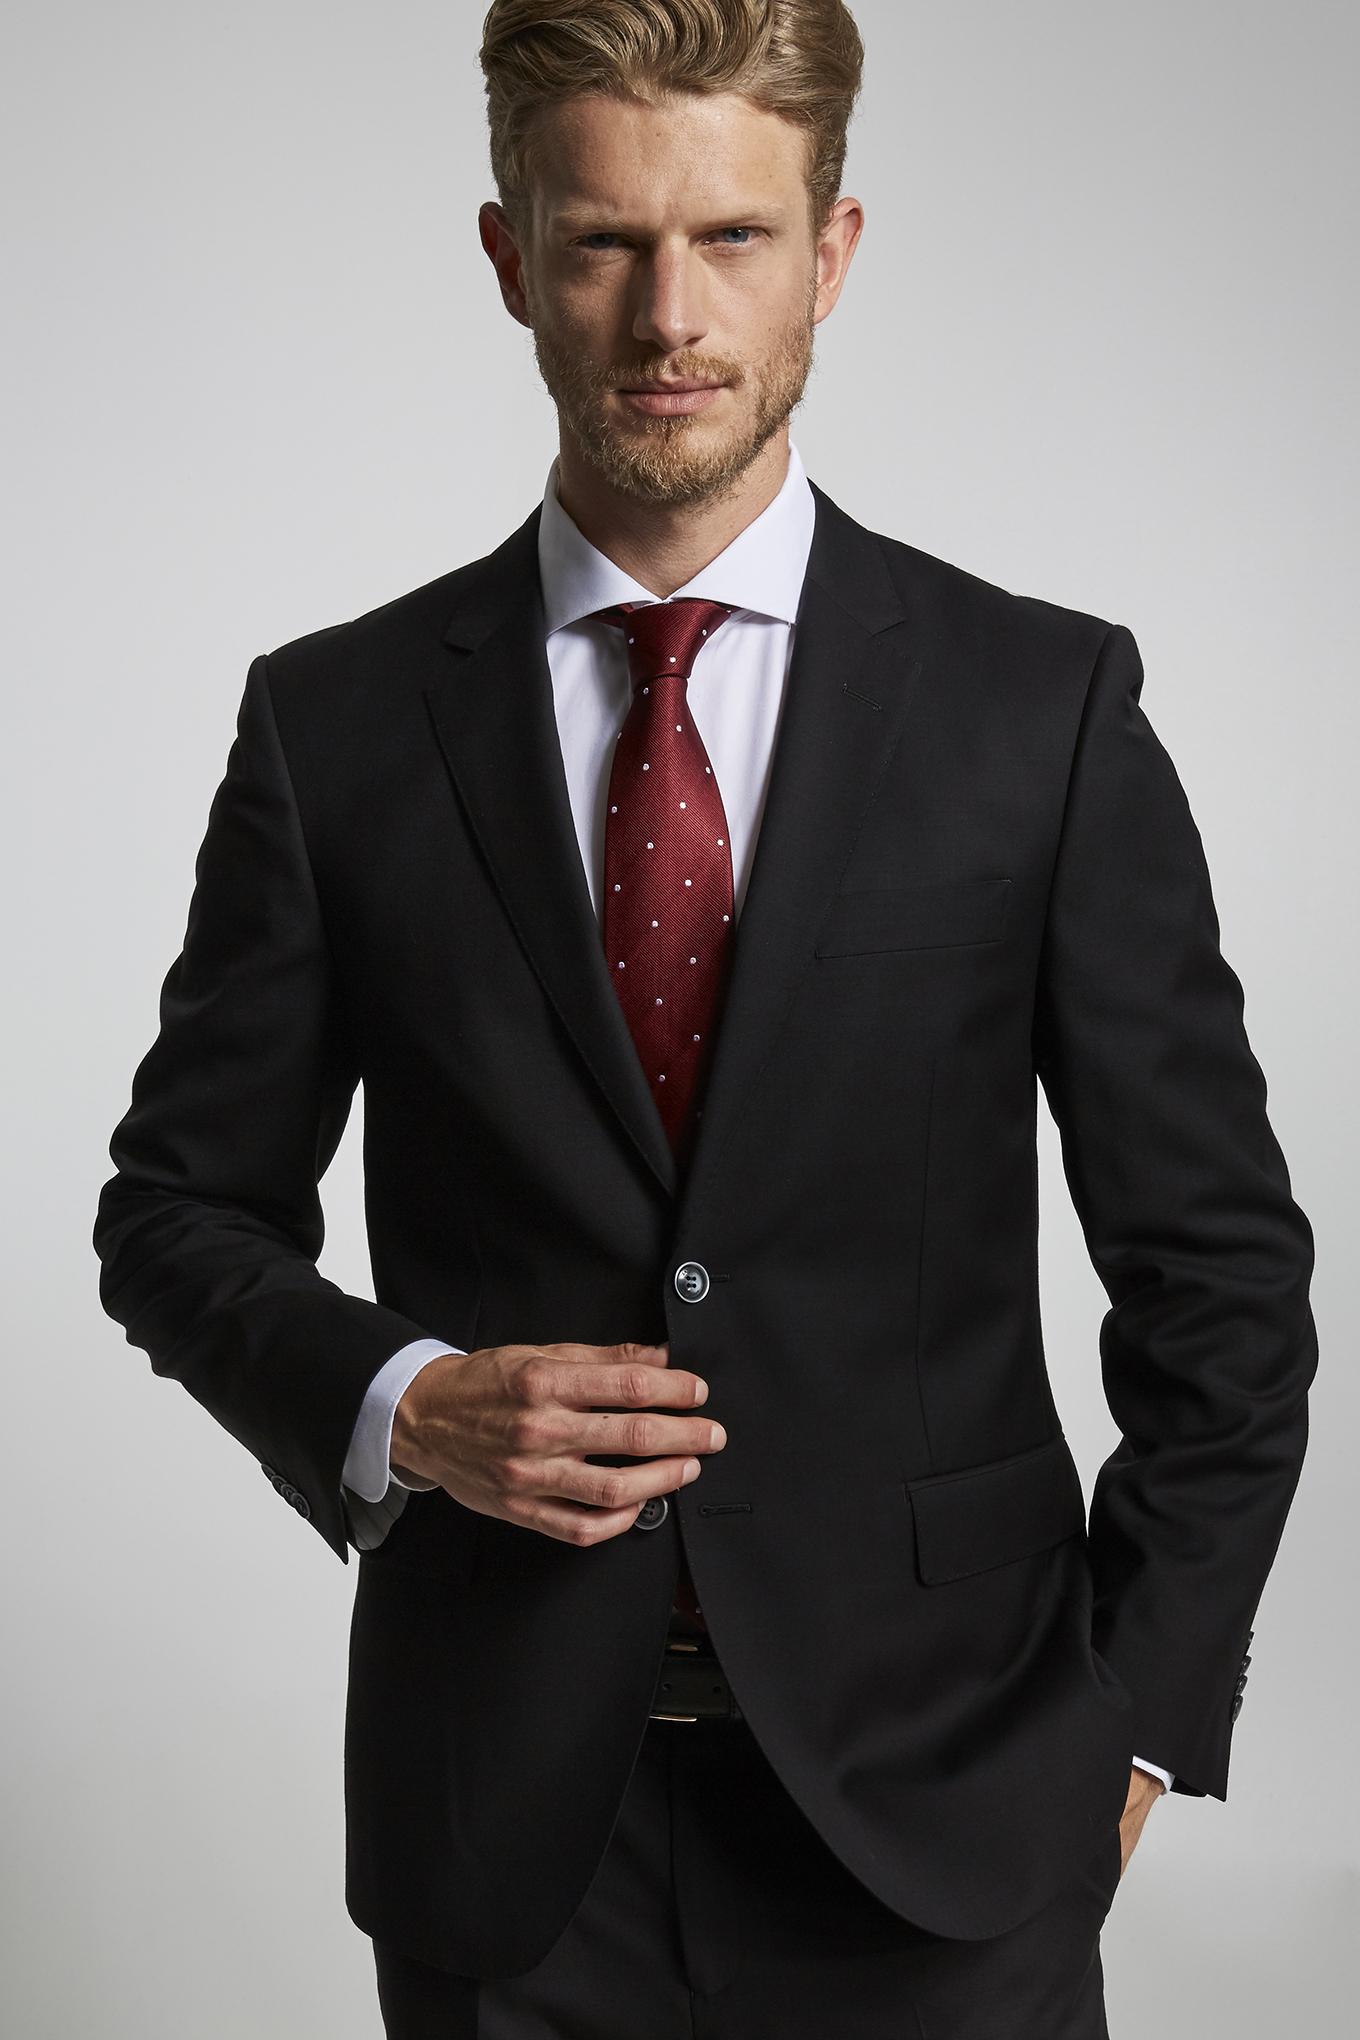 Suit Black Classic Man